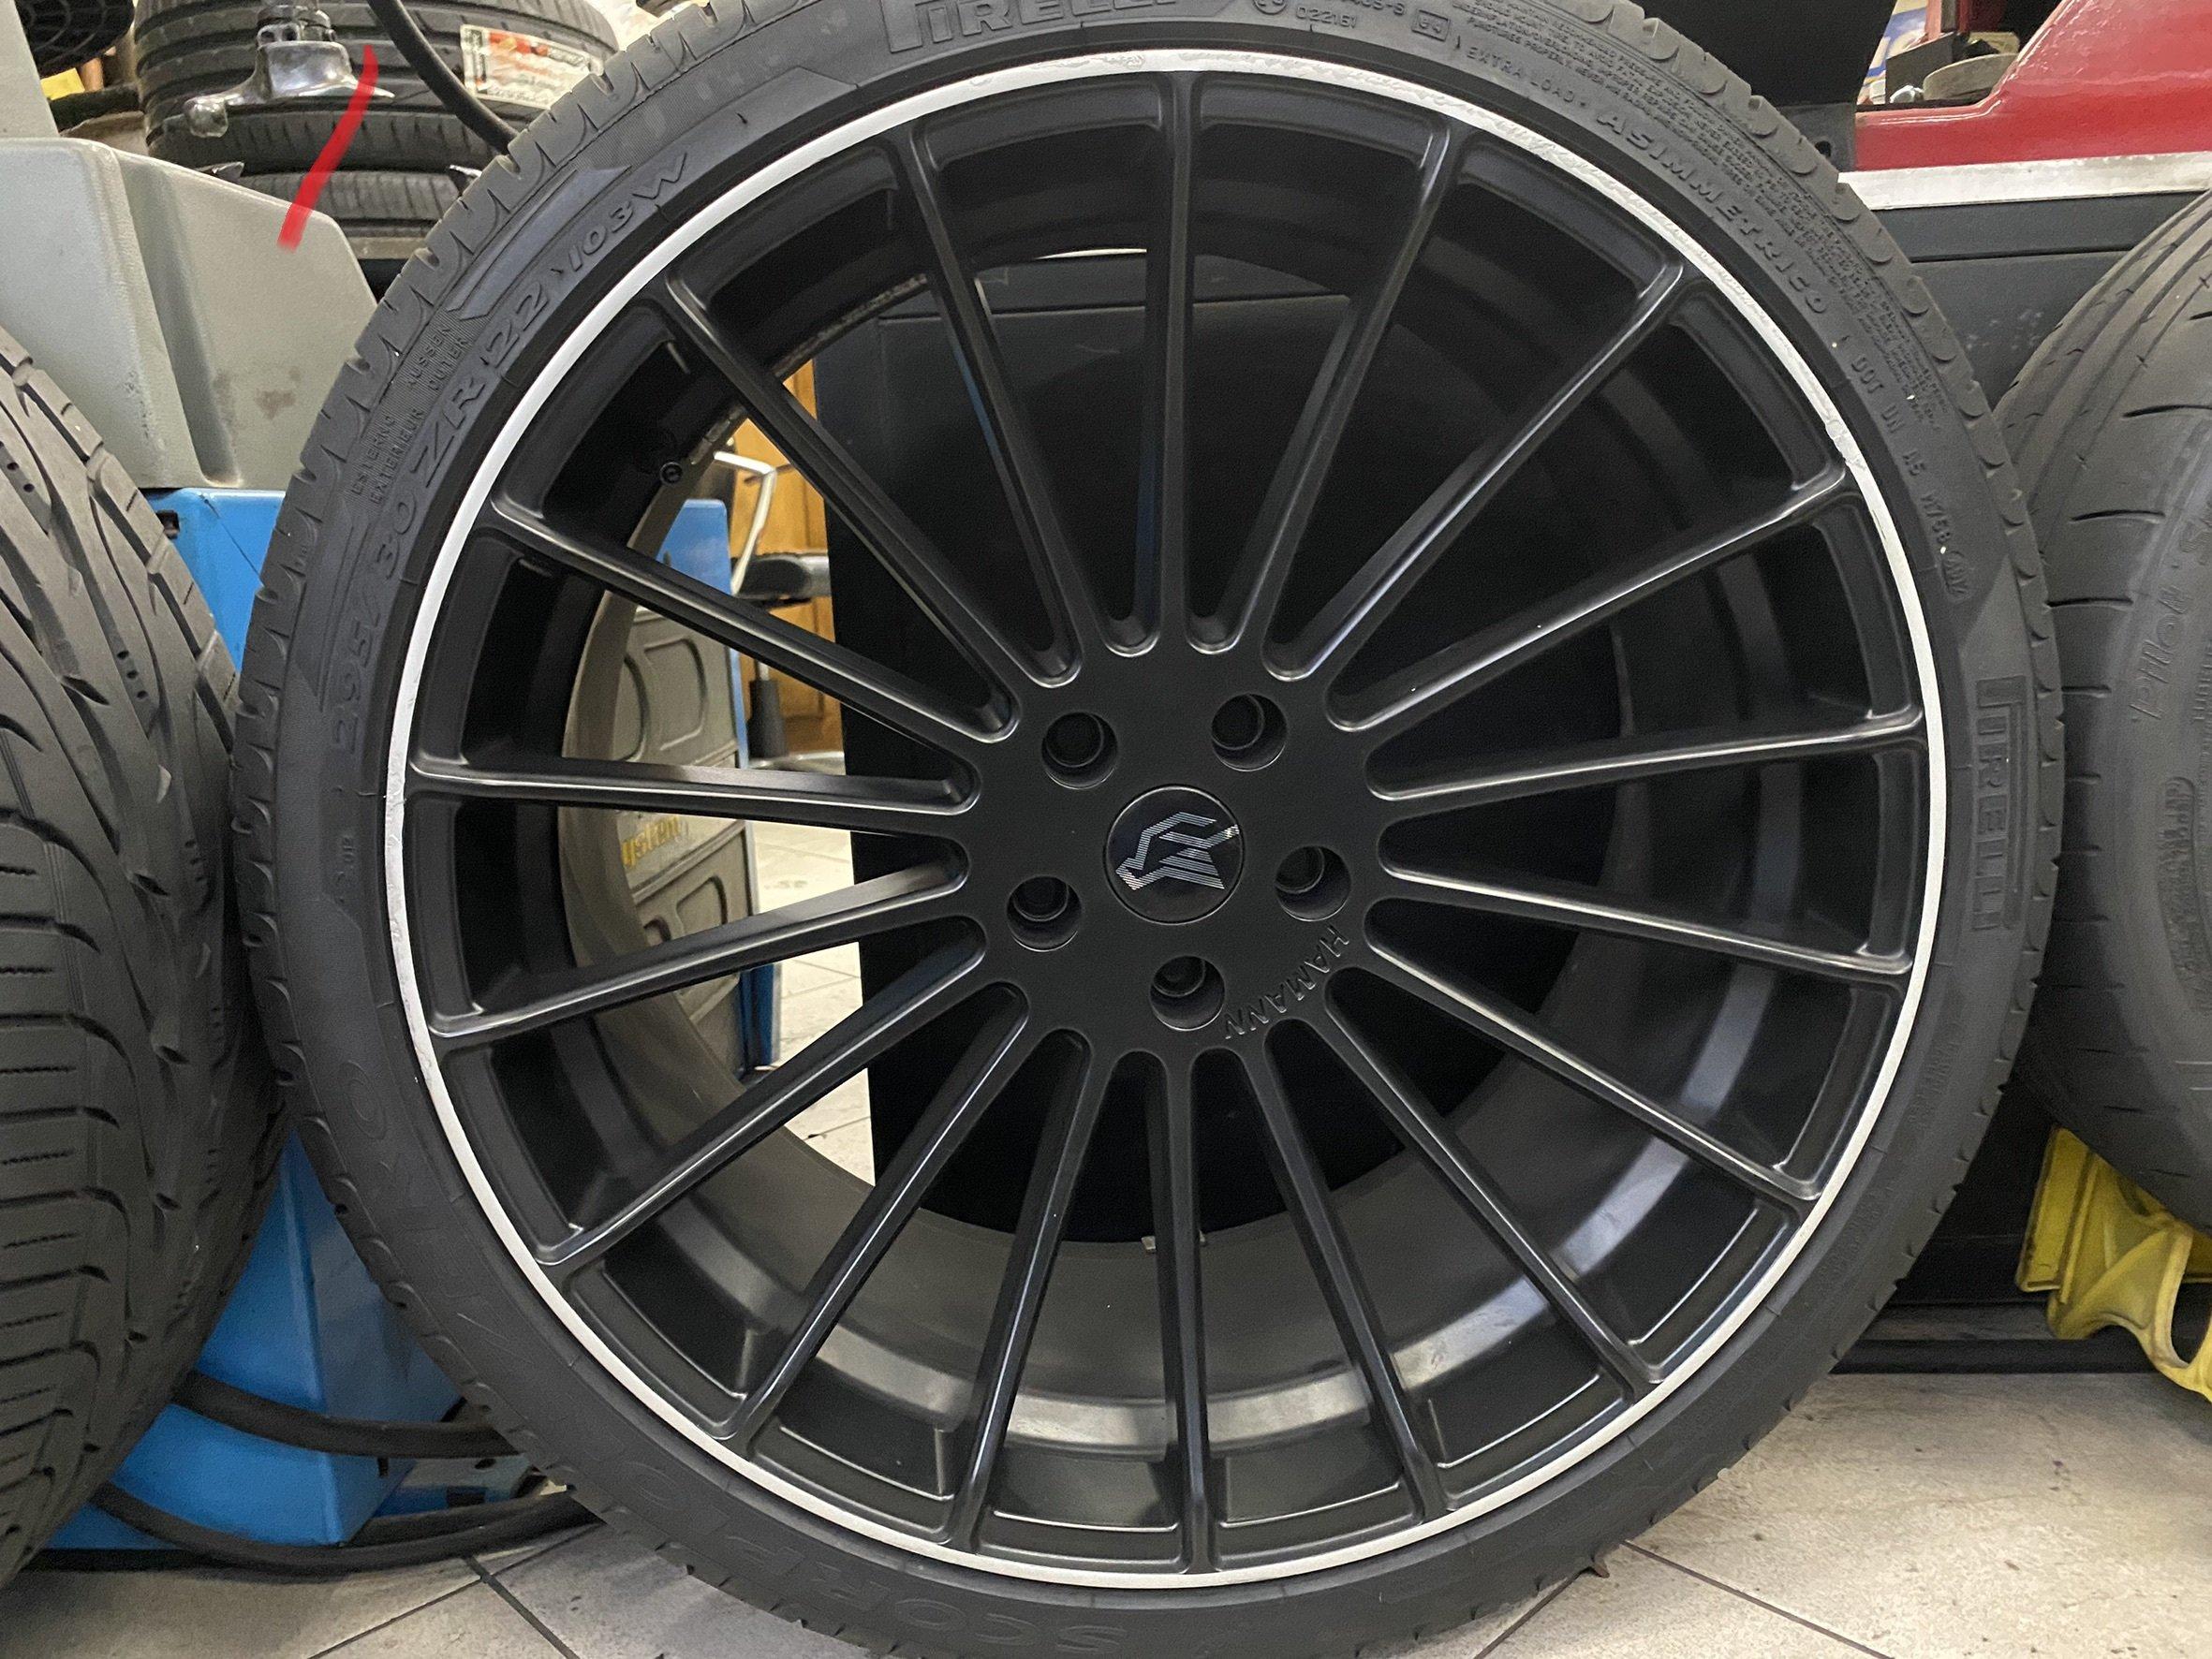 BMW 真品 hamann 22吋鋁圈含倍耐力胎 295-30-22  無前後配    X5 X6